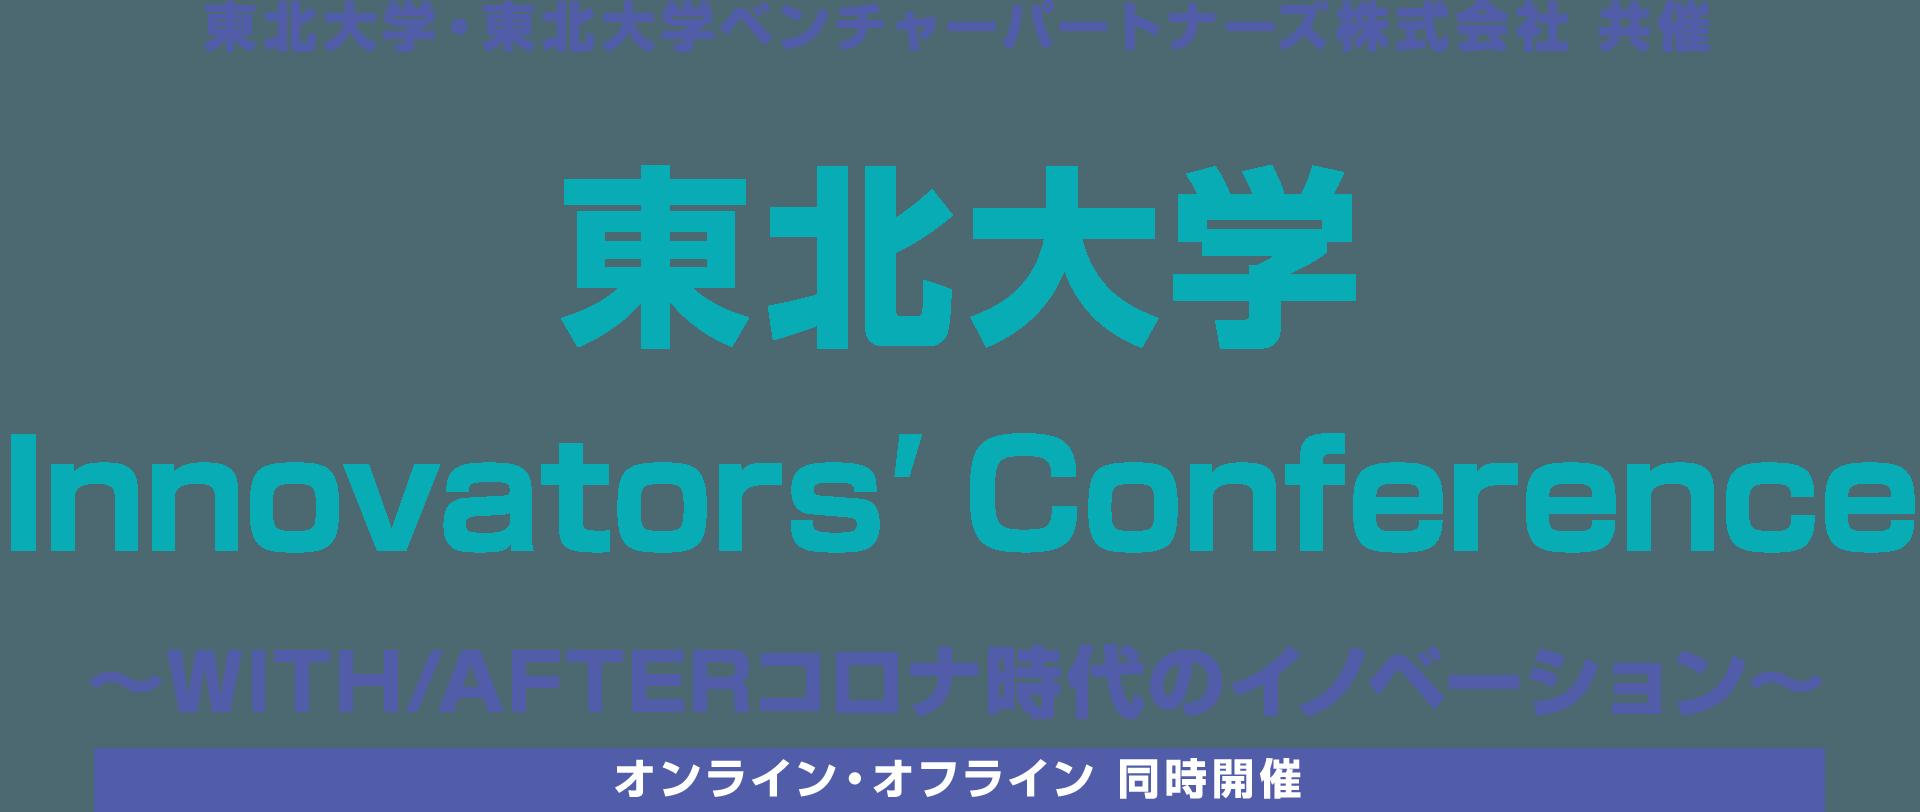 Innovator's Conference